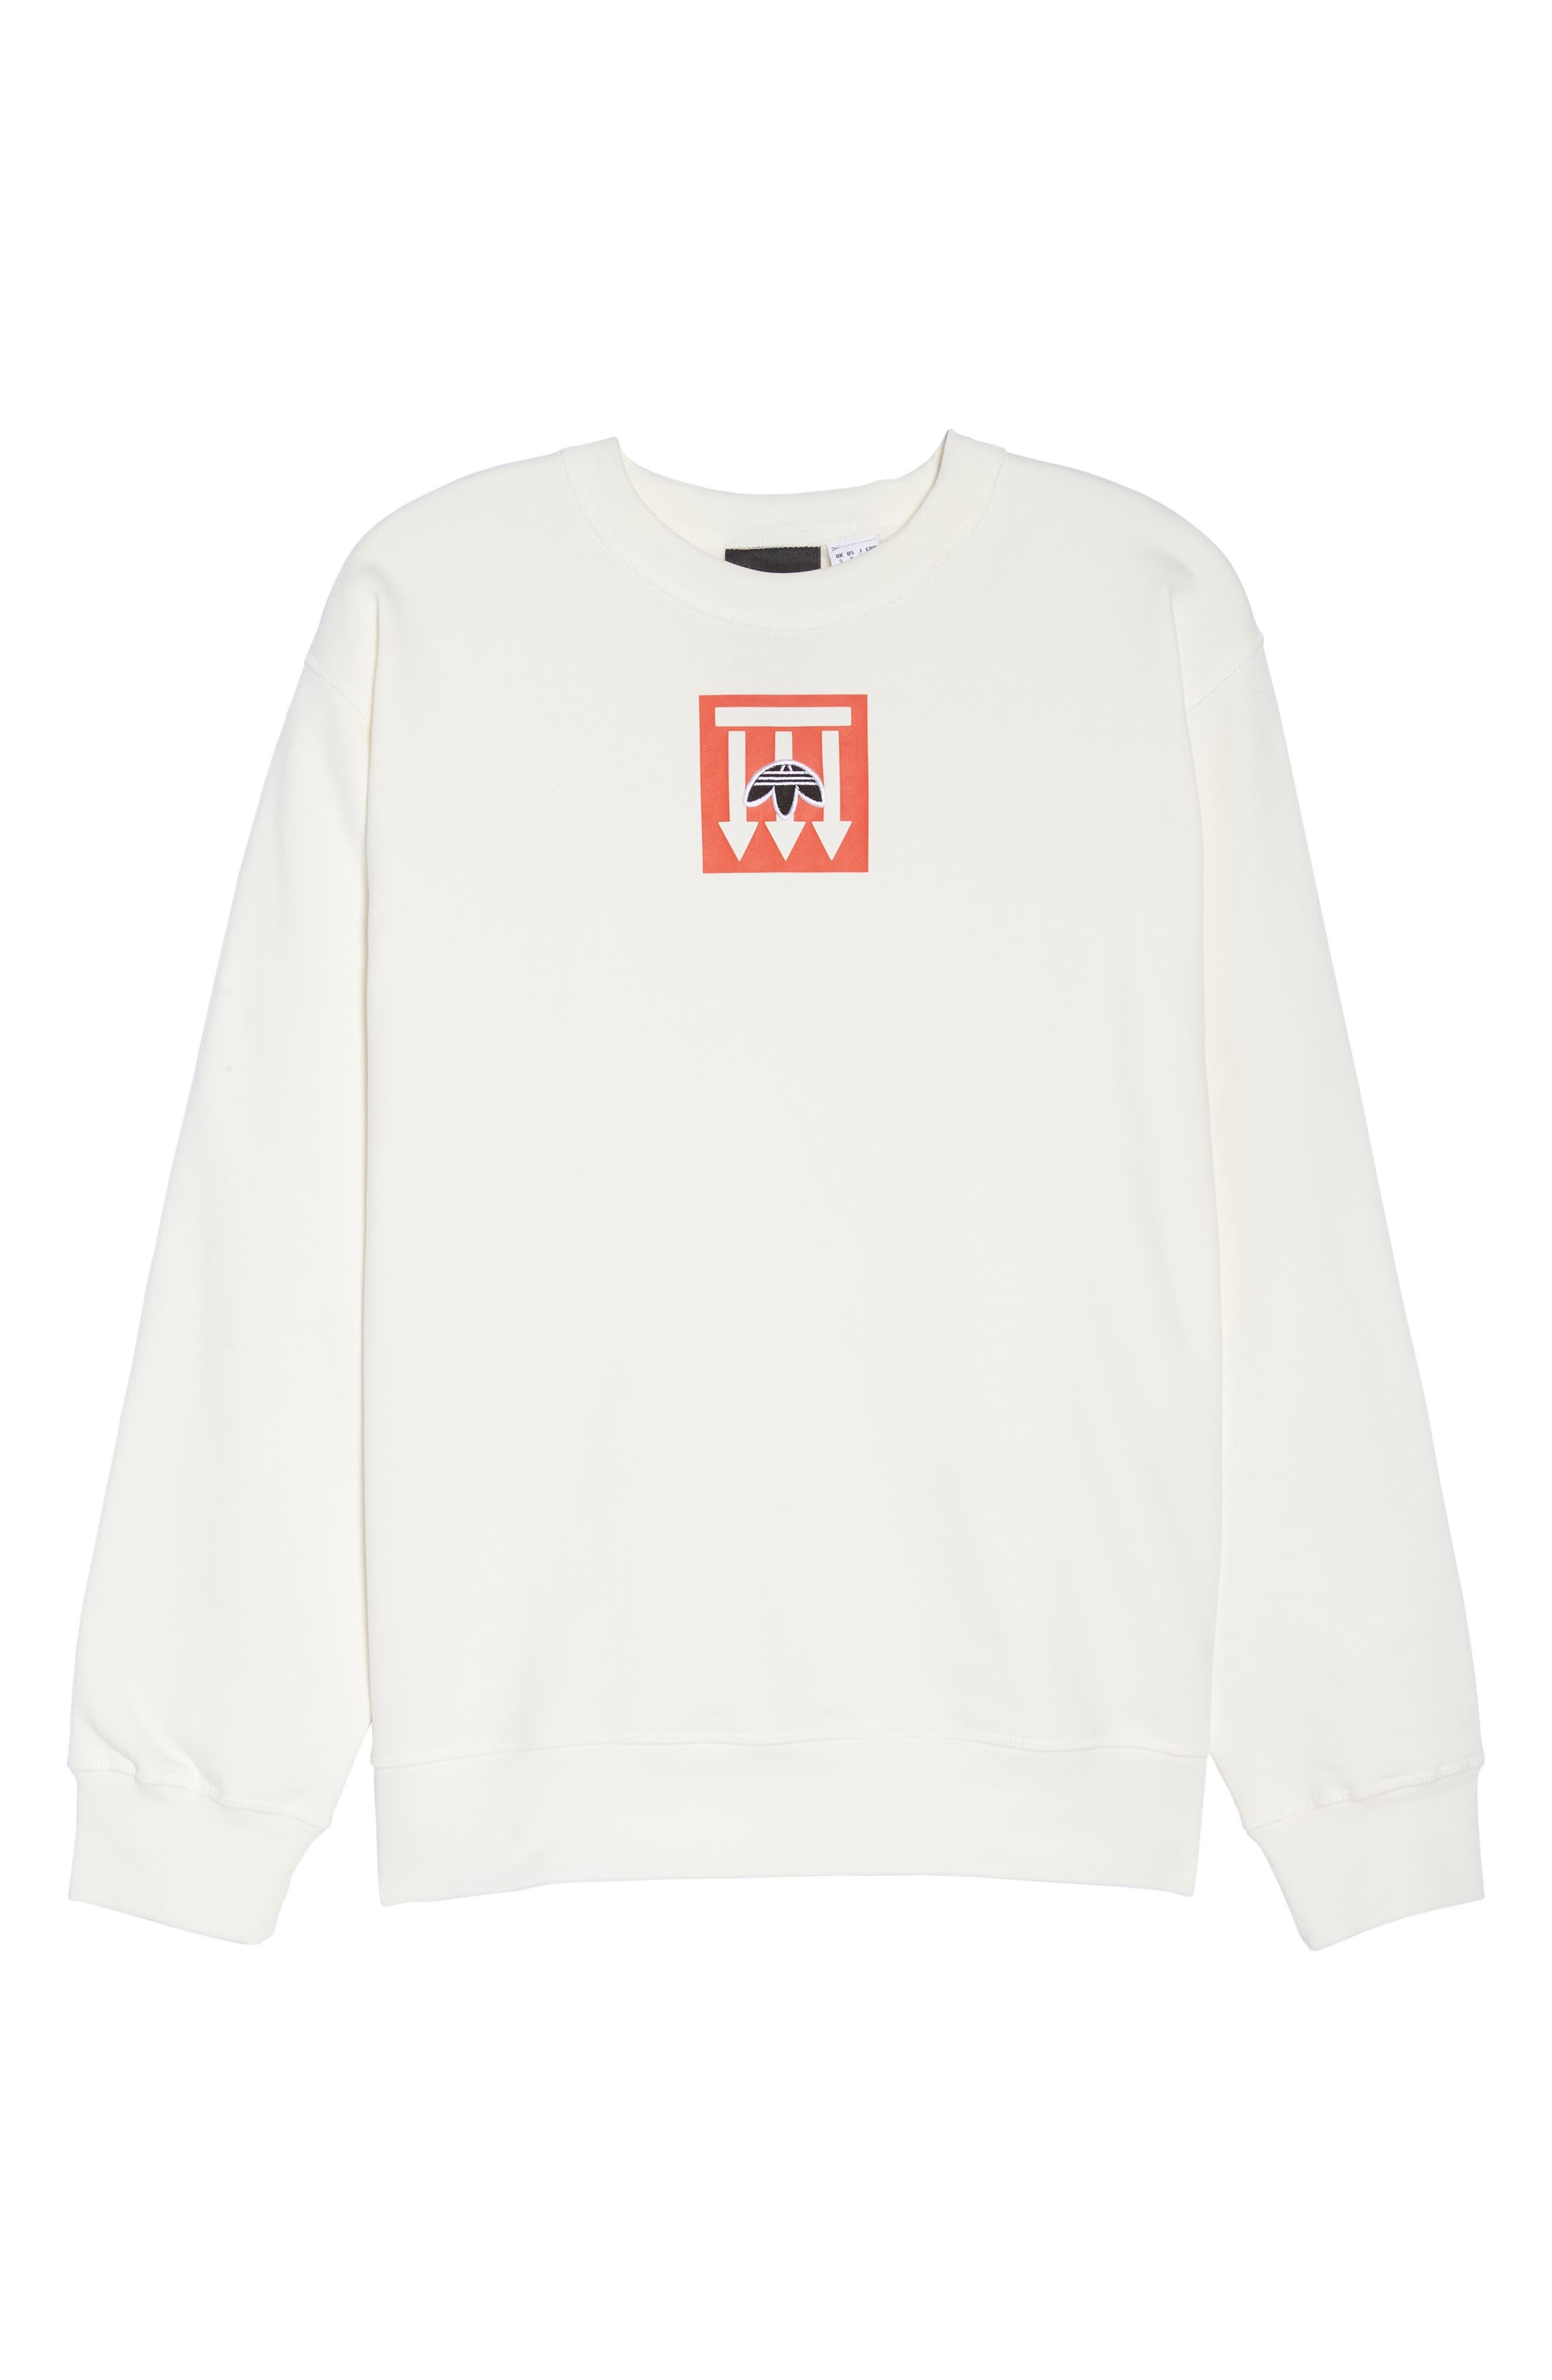 adidas x Alexander Wang Graphite Sweatshirt,                             Alternate thumbnail 7, color,                             900